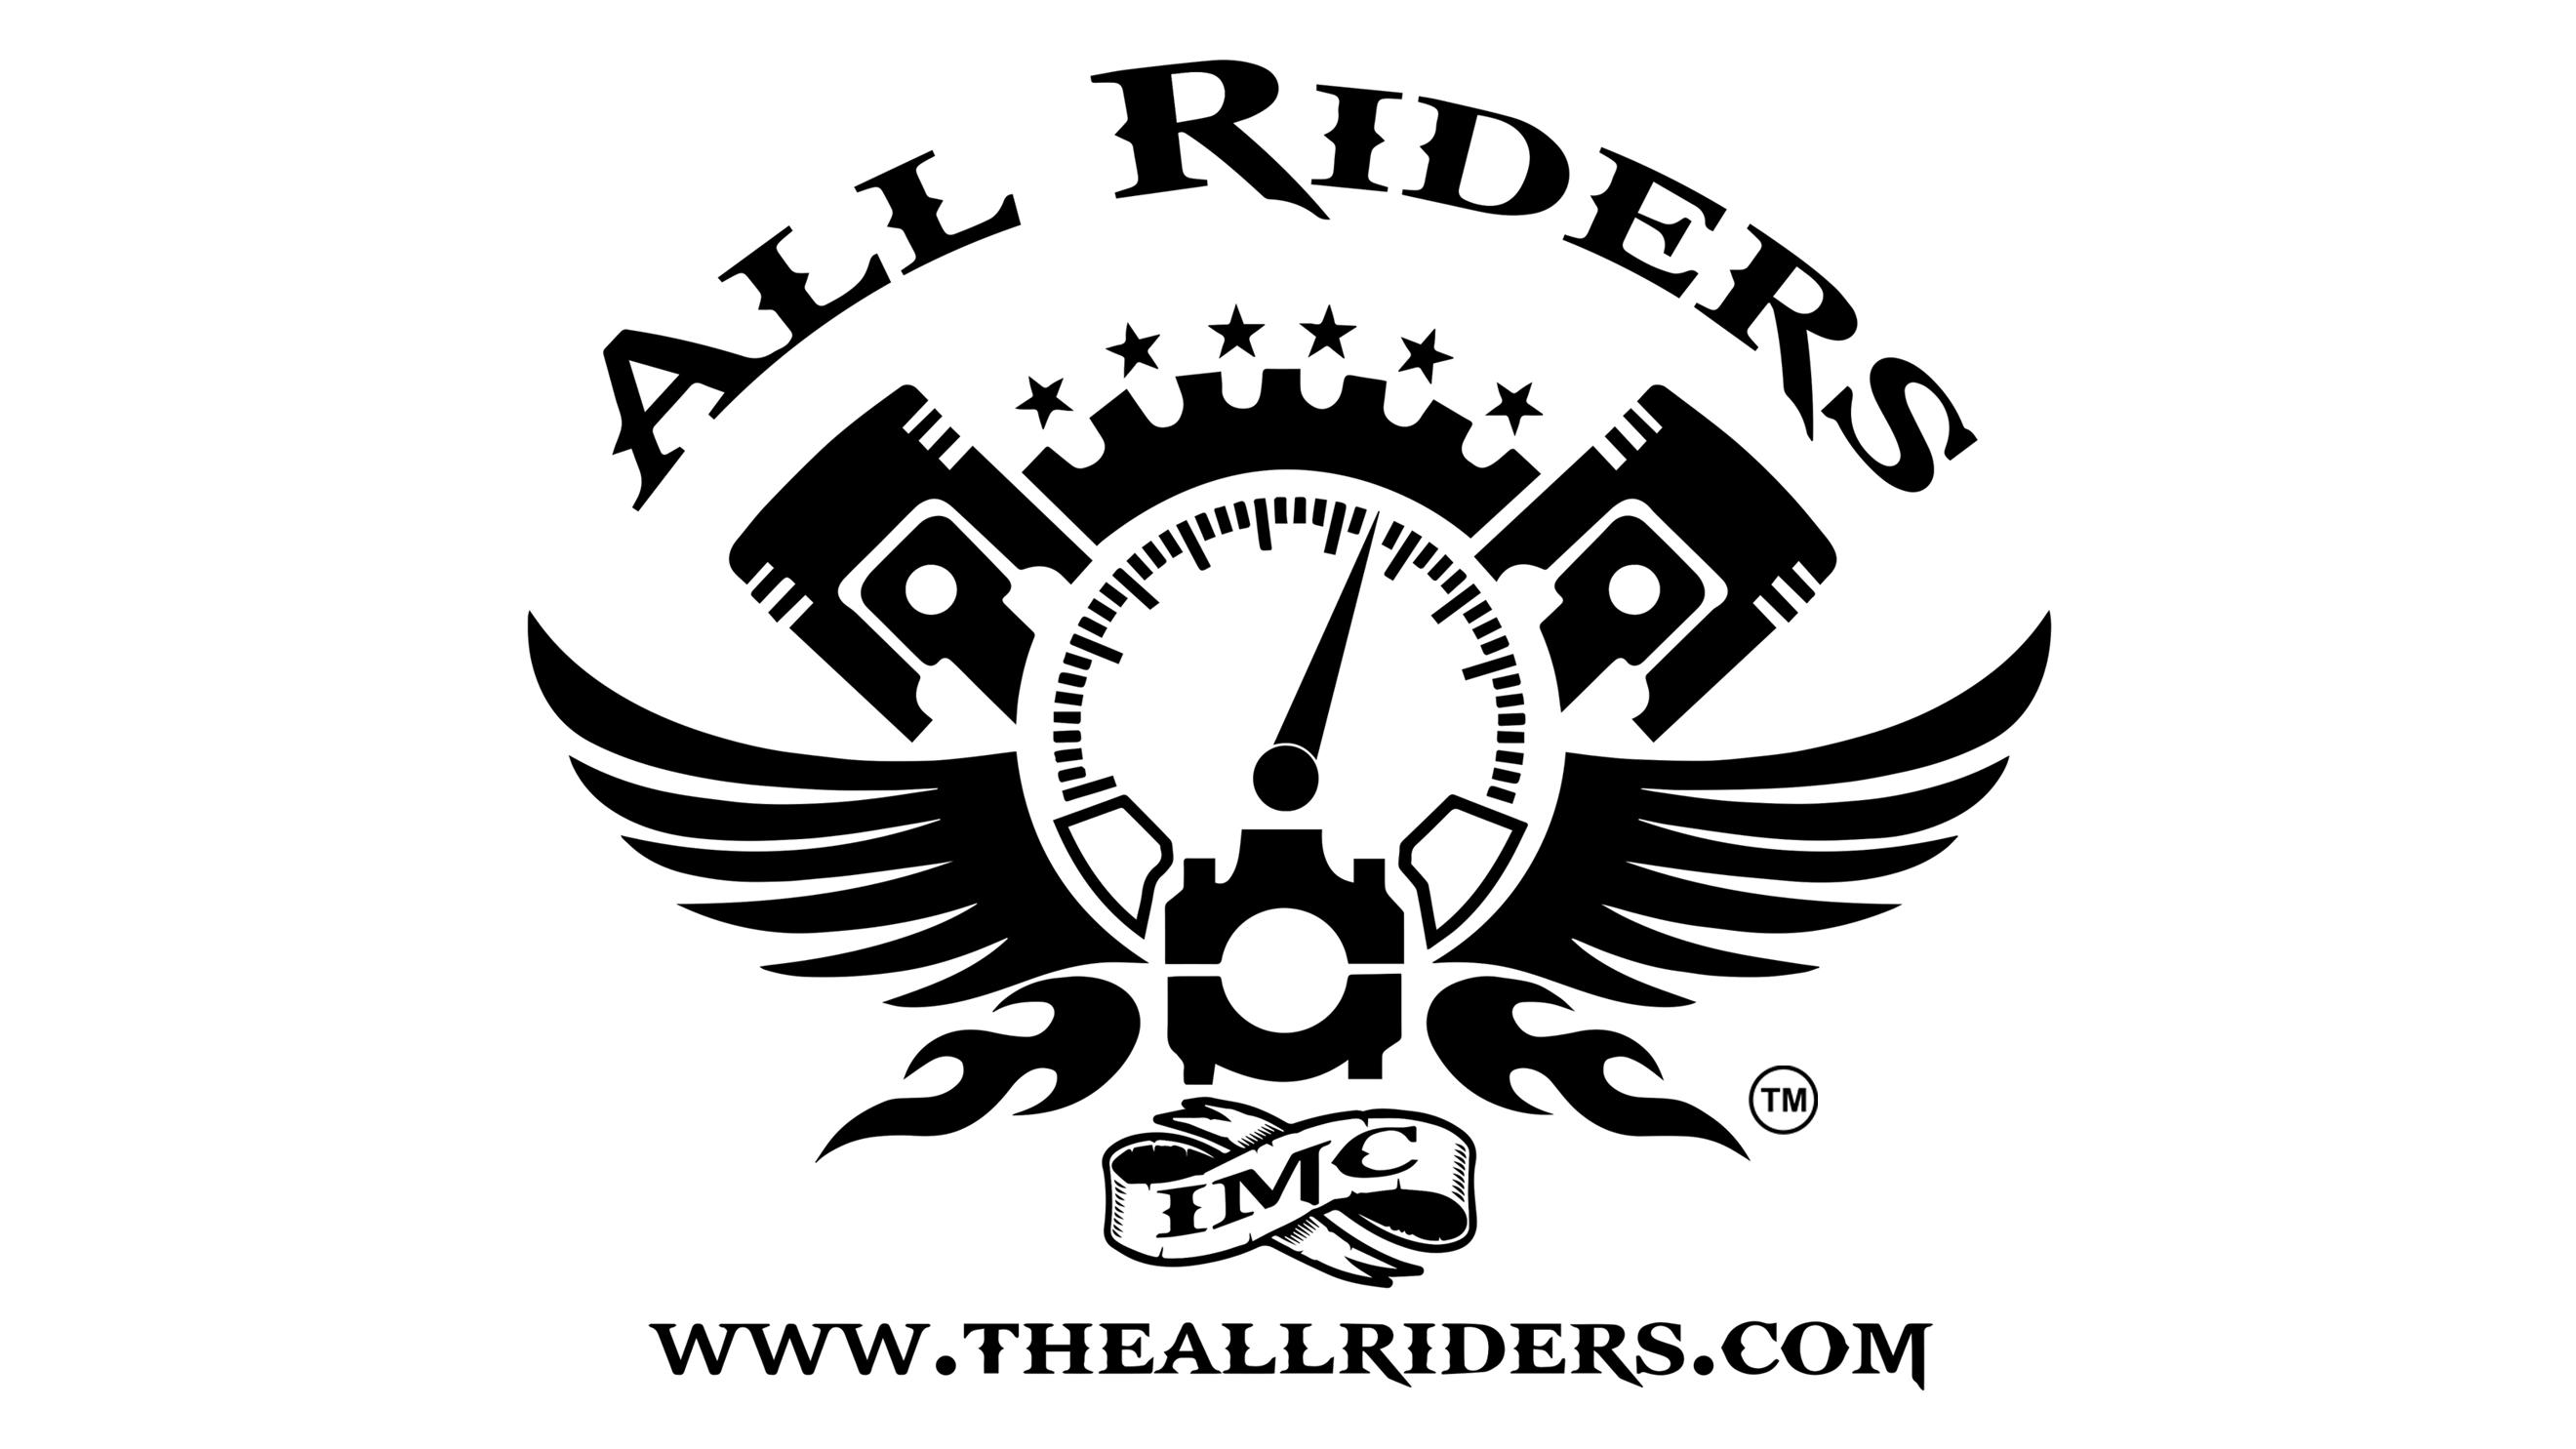 All Riders: IMC